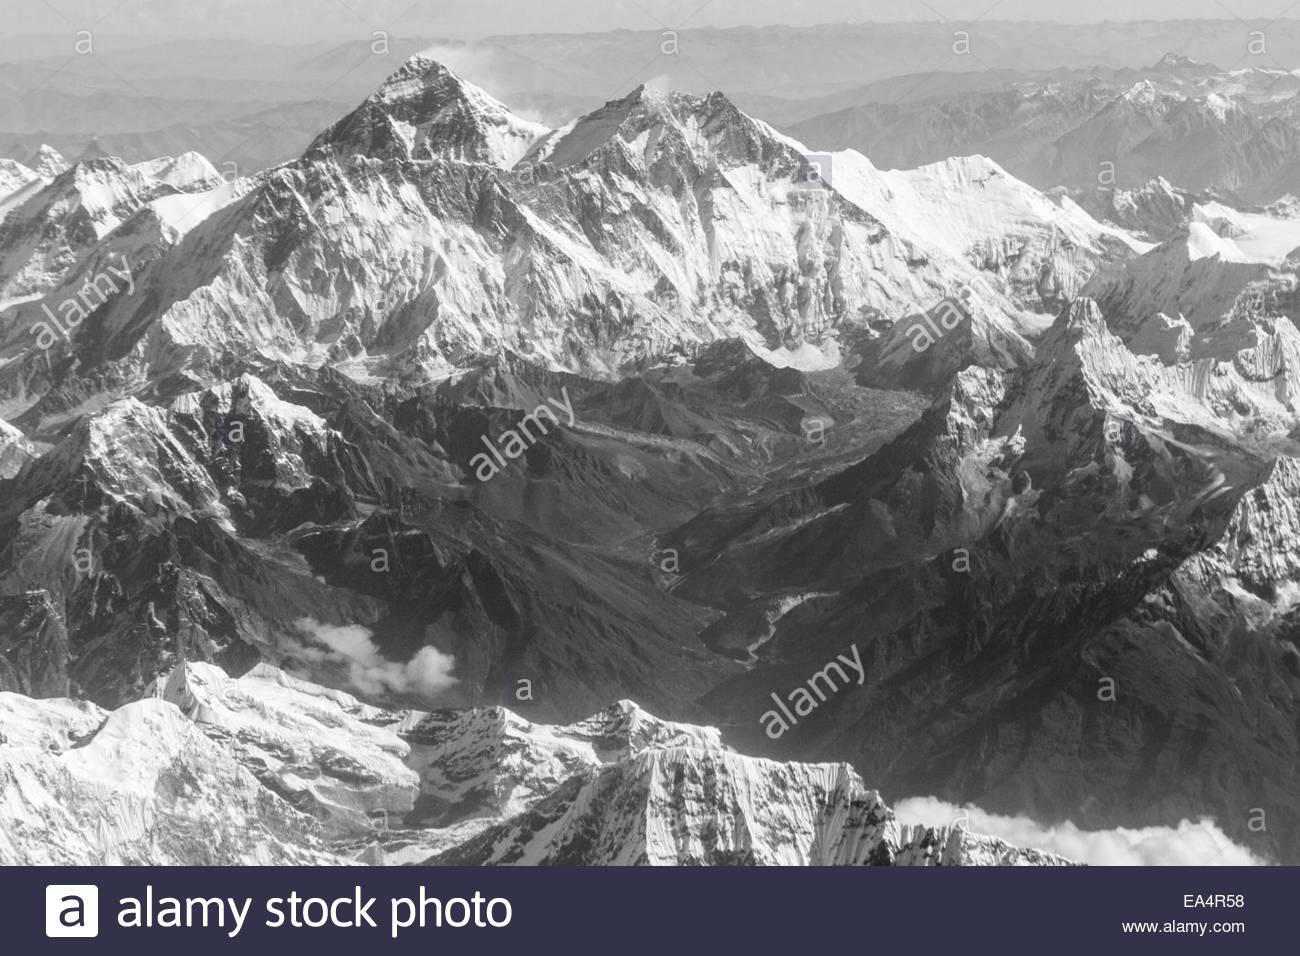 View of Himalayan Ranges - India - Stock Image